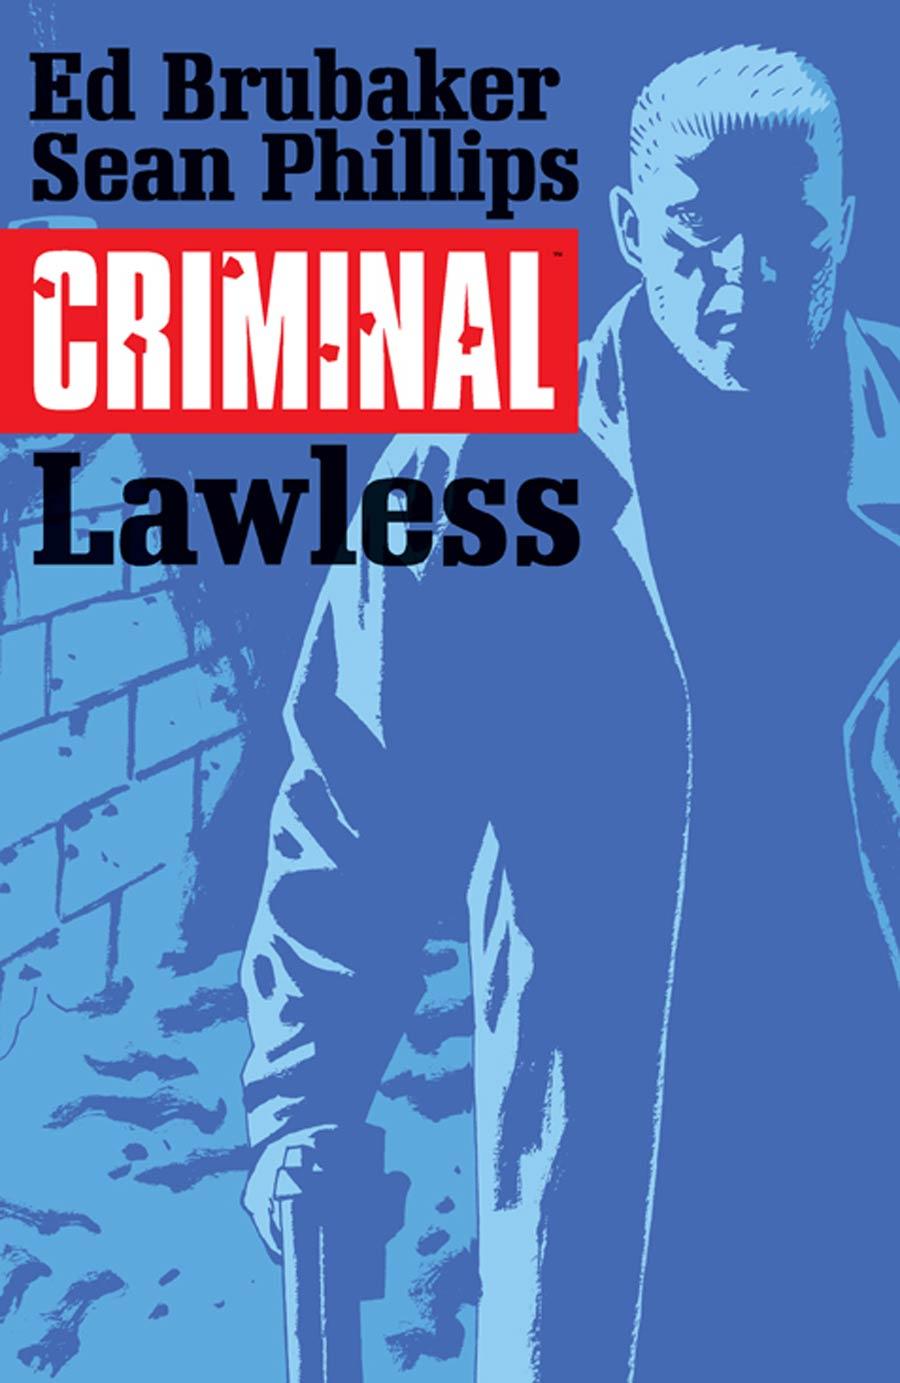 Criminal Vol 2 Lawless TP Image Edition